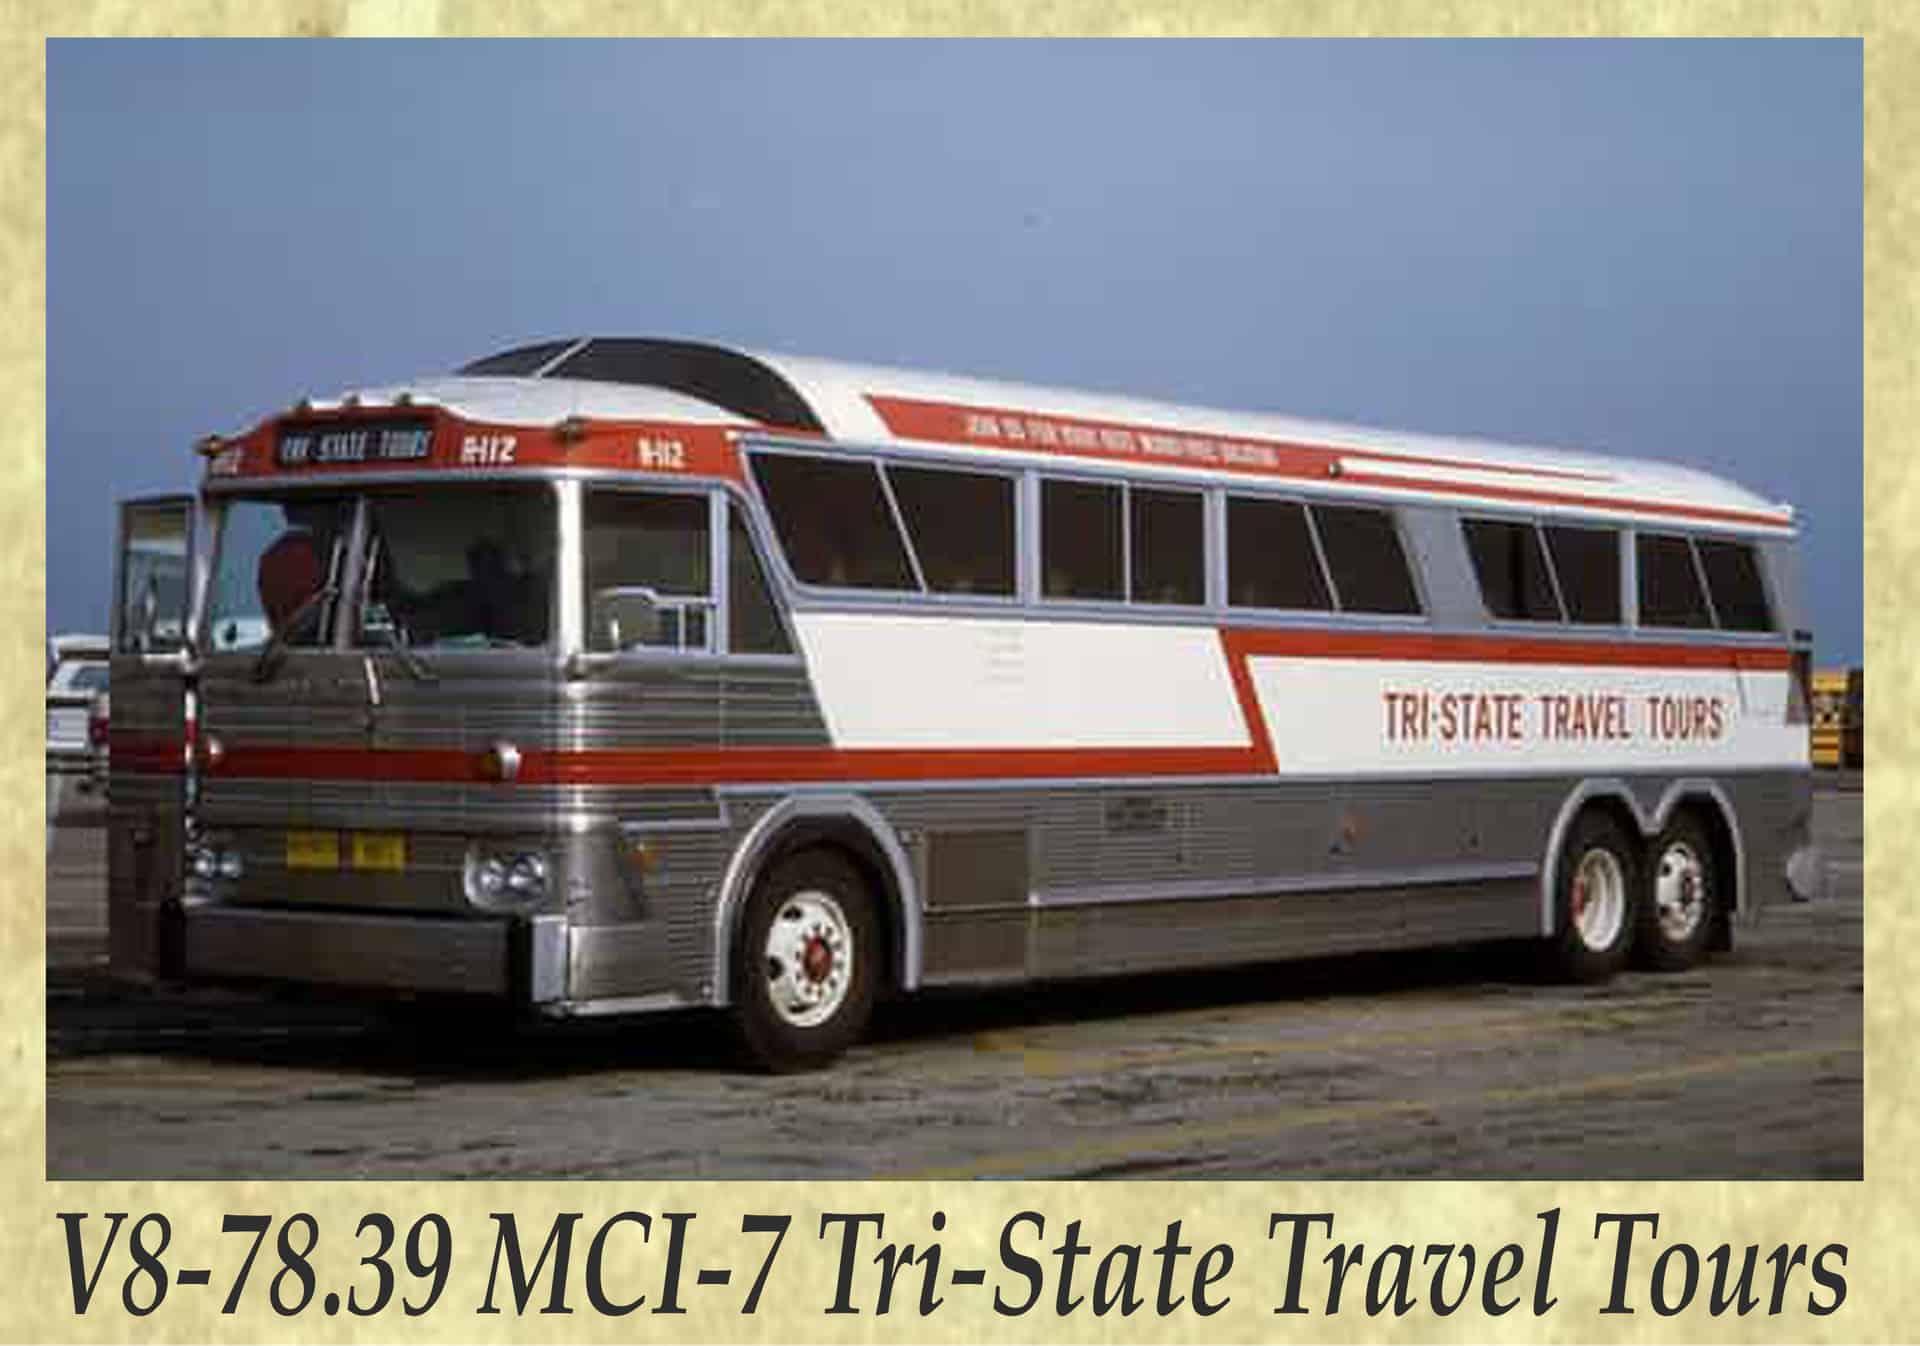 V8-78.39 MCI-7 Tri-State Travel Tours